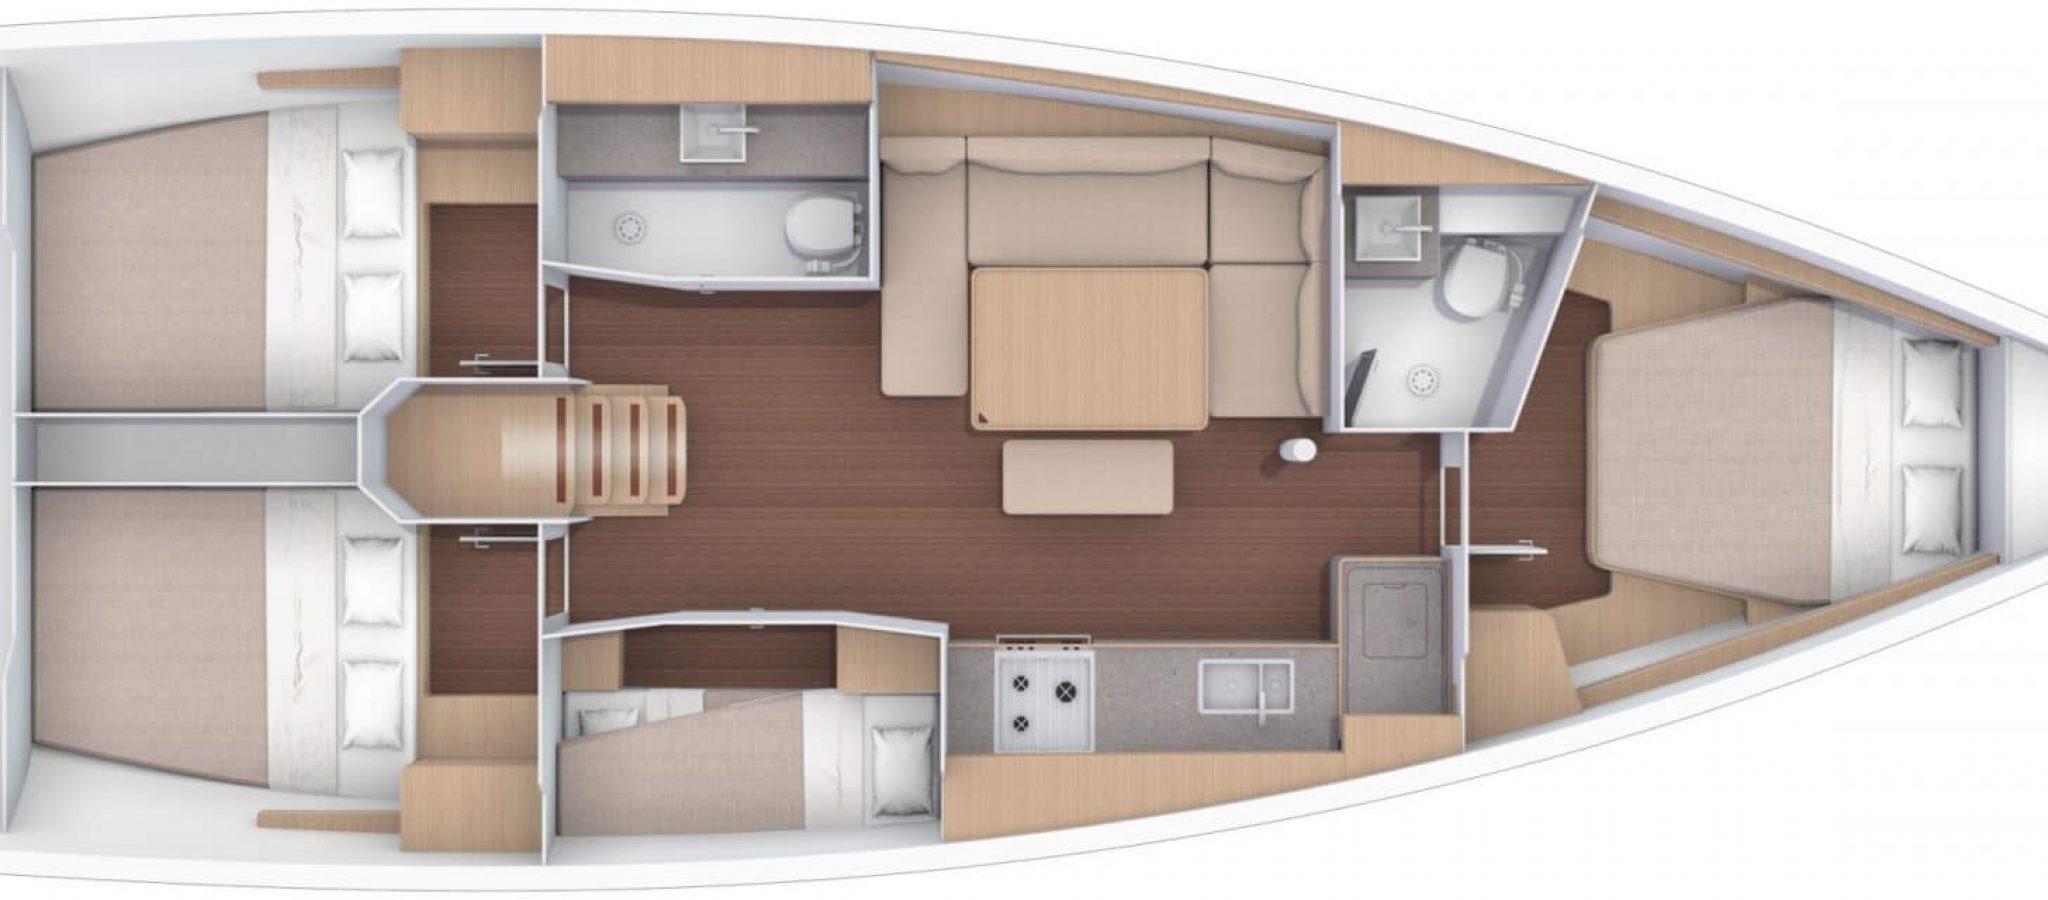 Dufour 430 plan 4 cabines